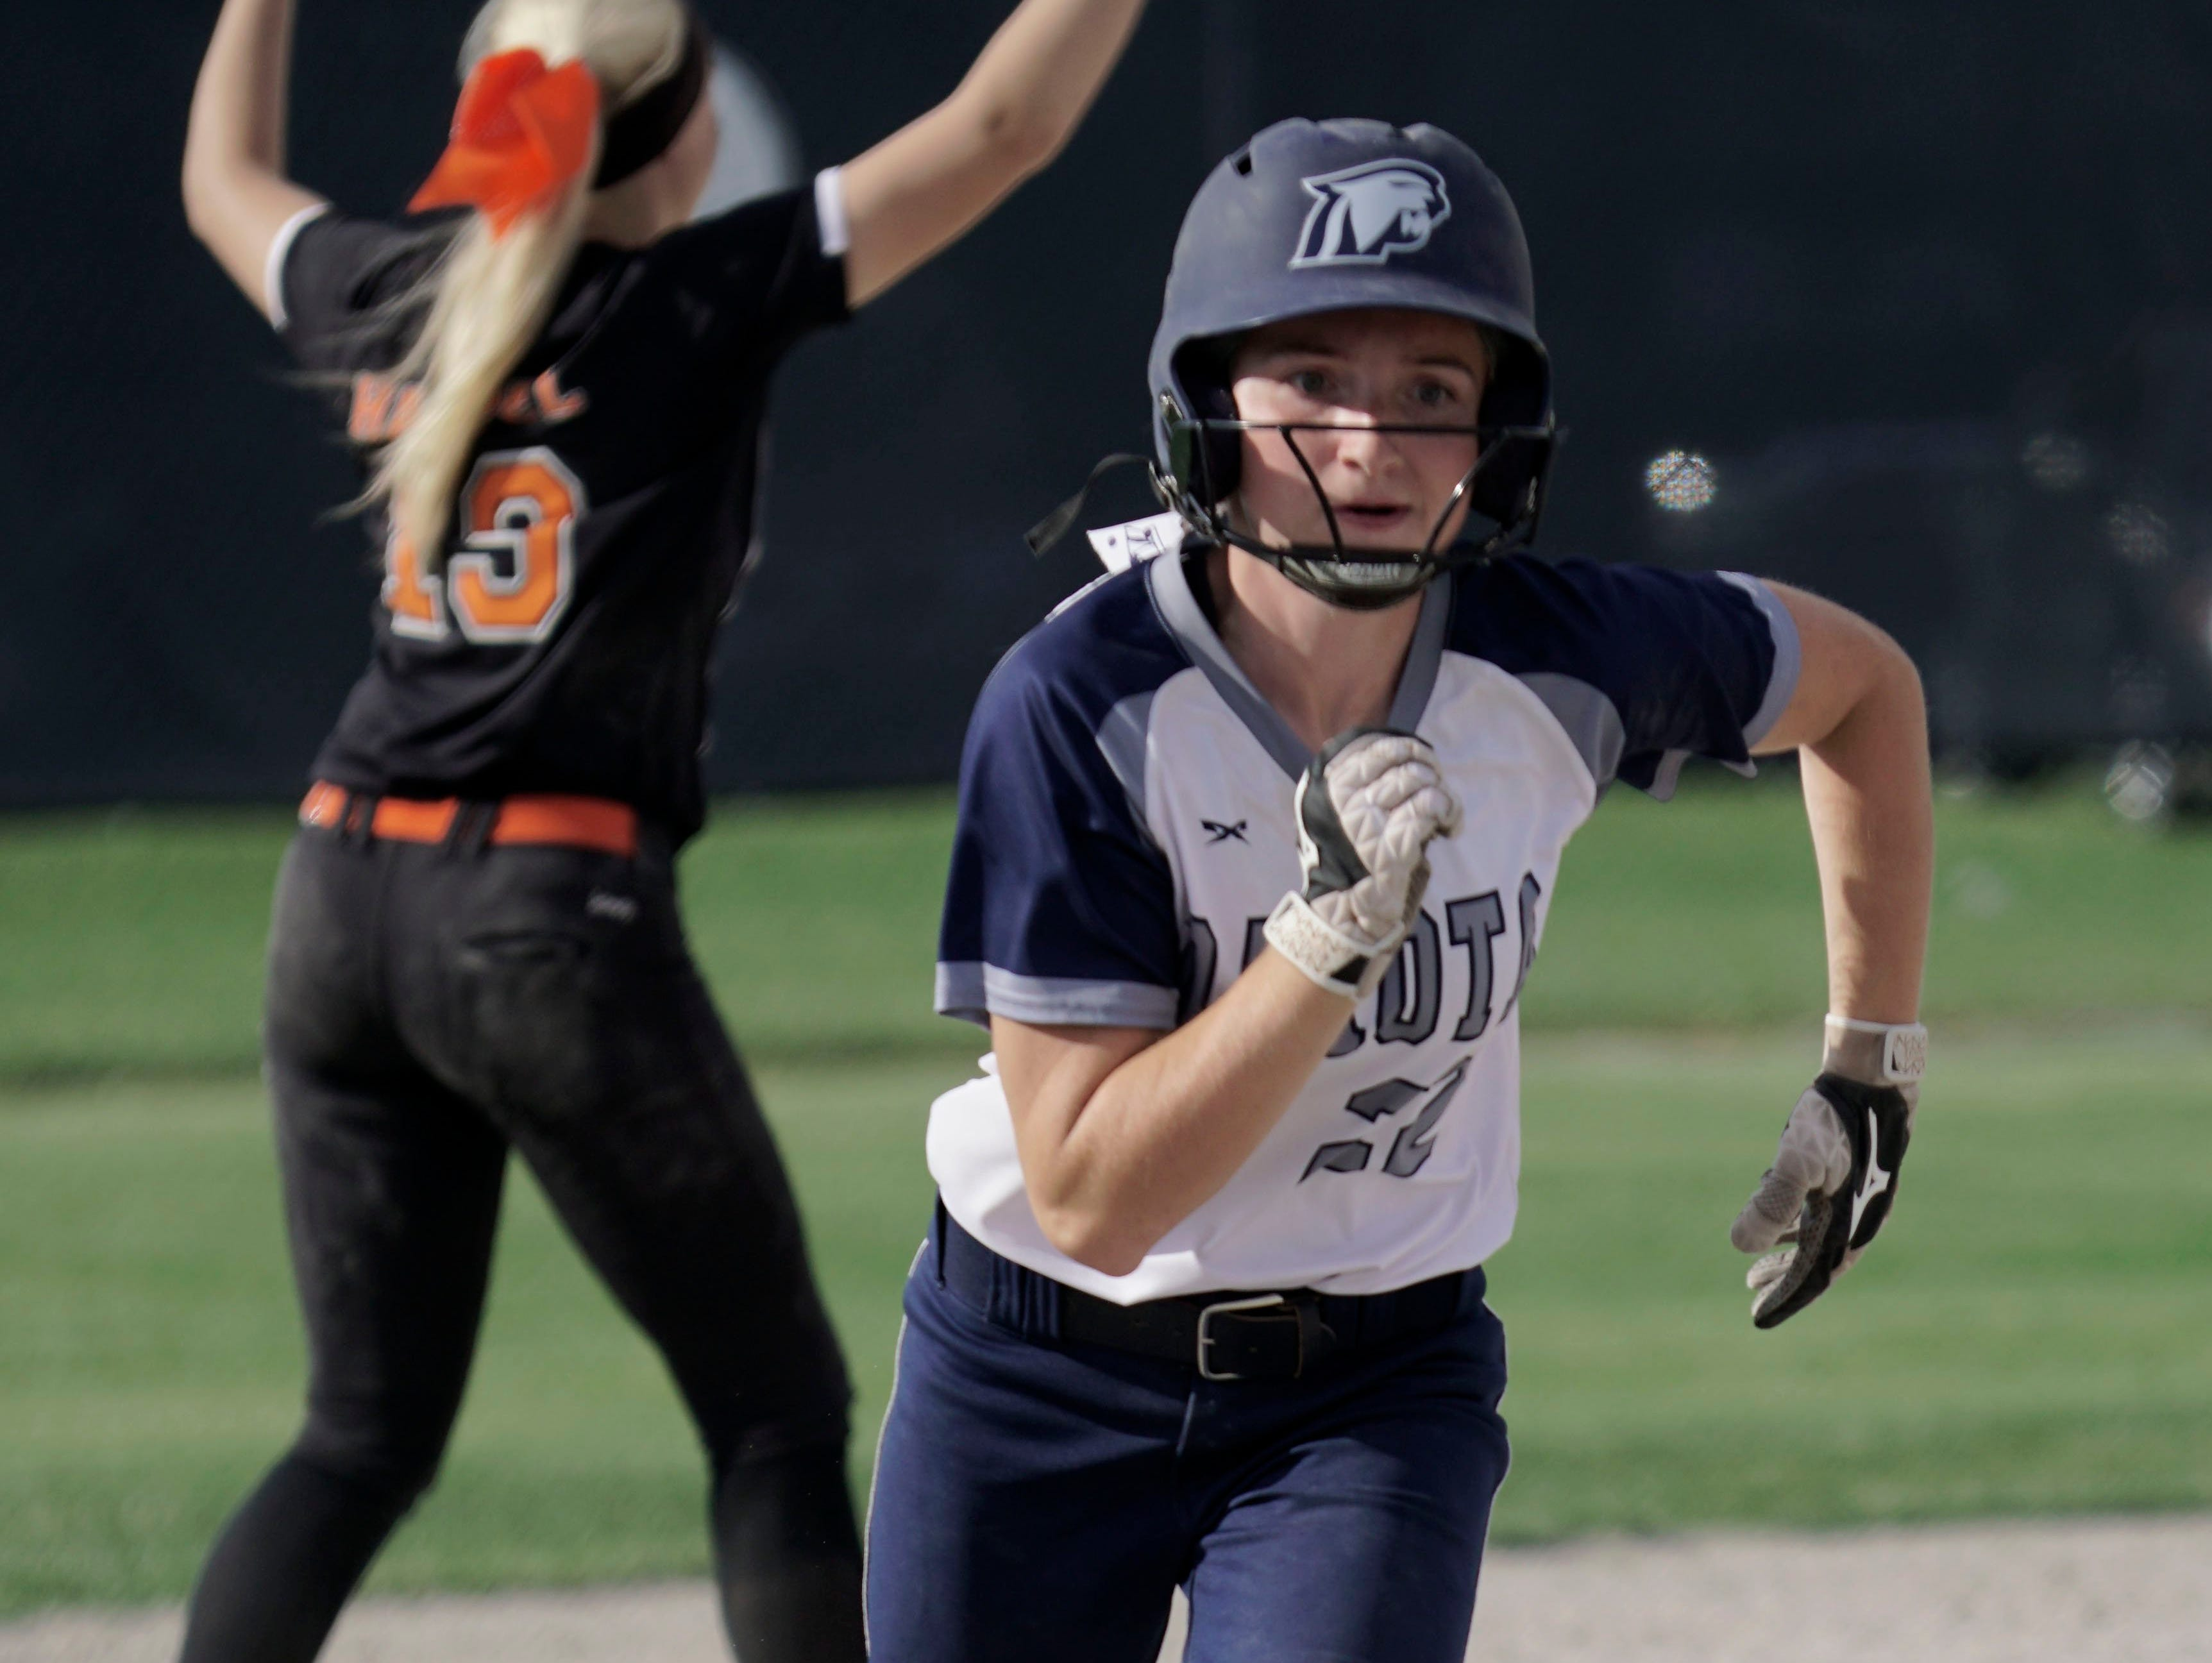 Macomb Dakota's Melissa Charbonneau sprints to third base during Dakota's 9-1 win over Utica Tuesday at Sterling Heights Stevenson.